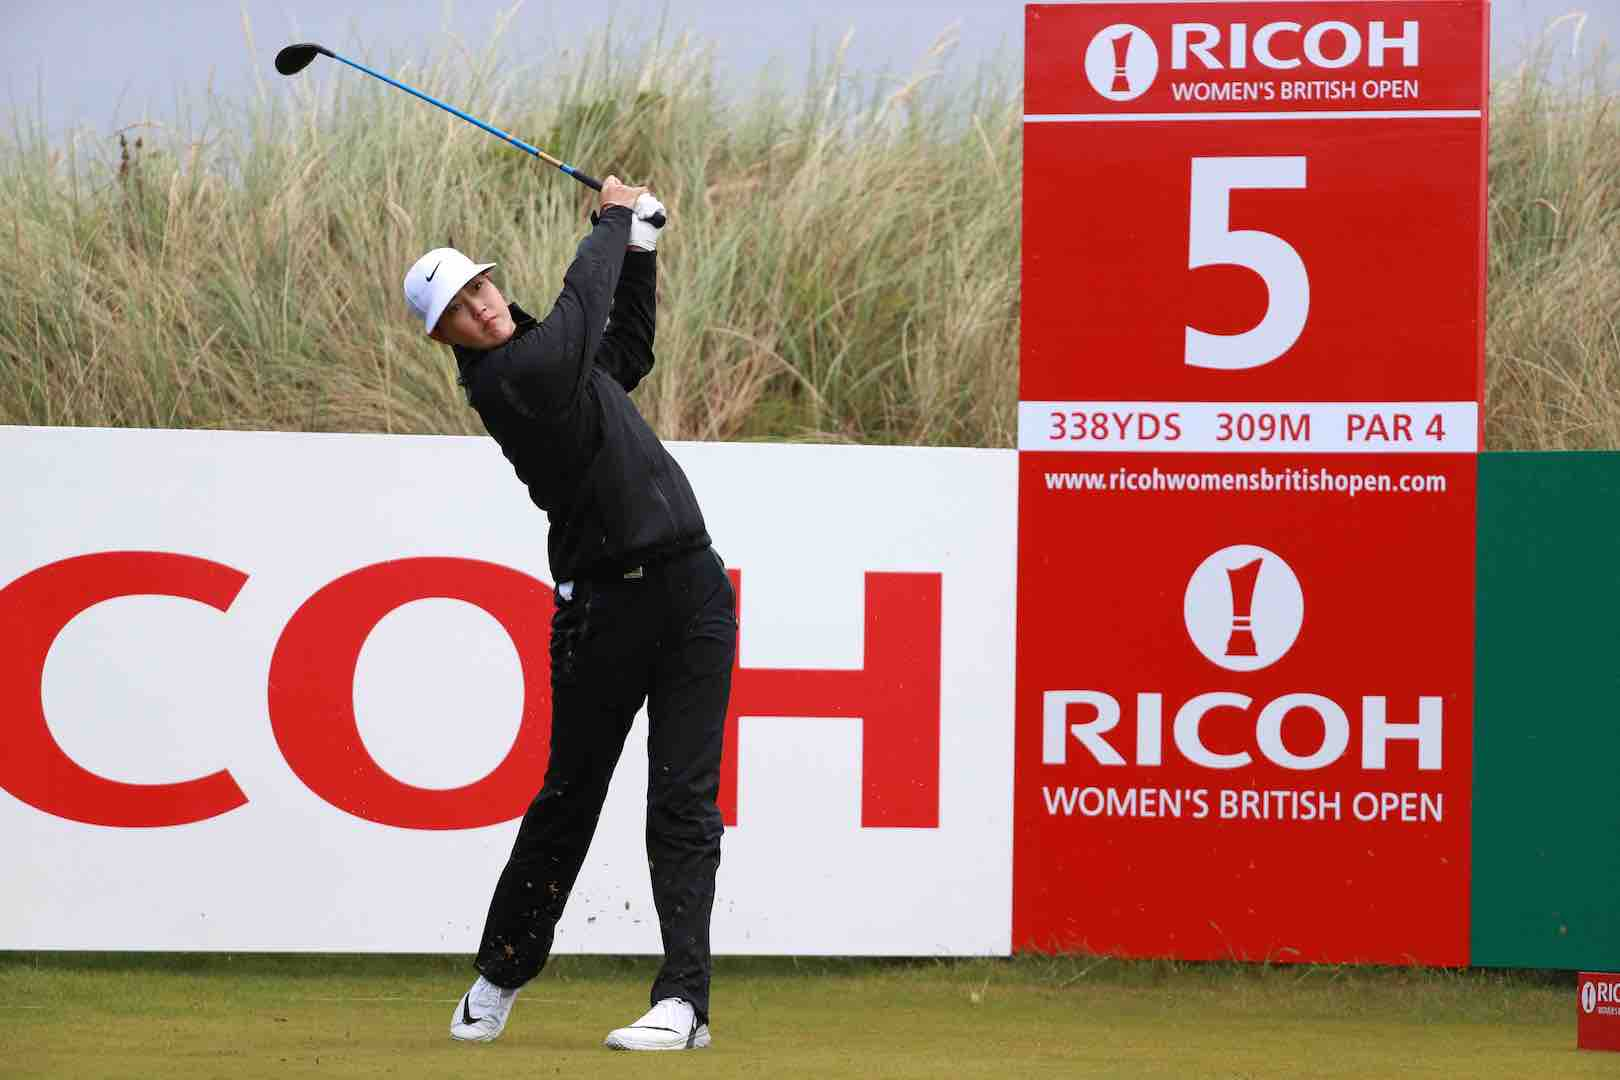 Golf Spiv calls the Ricoh British Women's Open